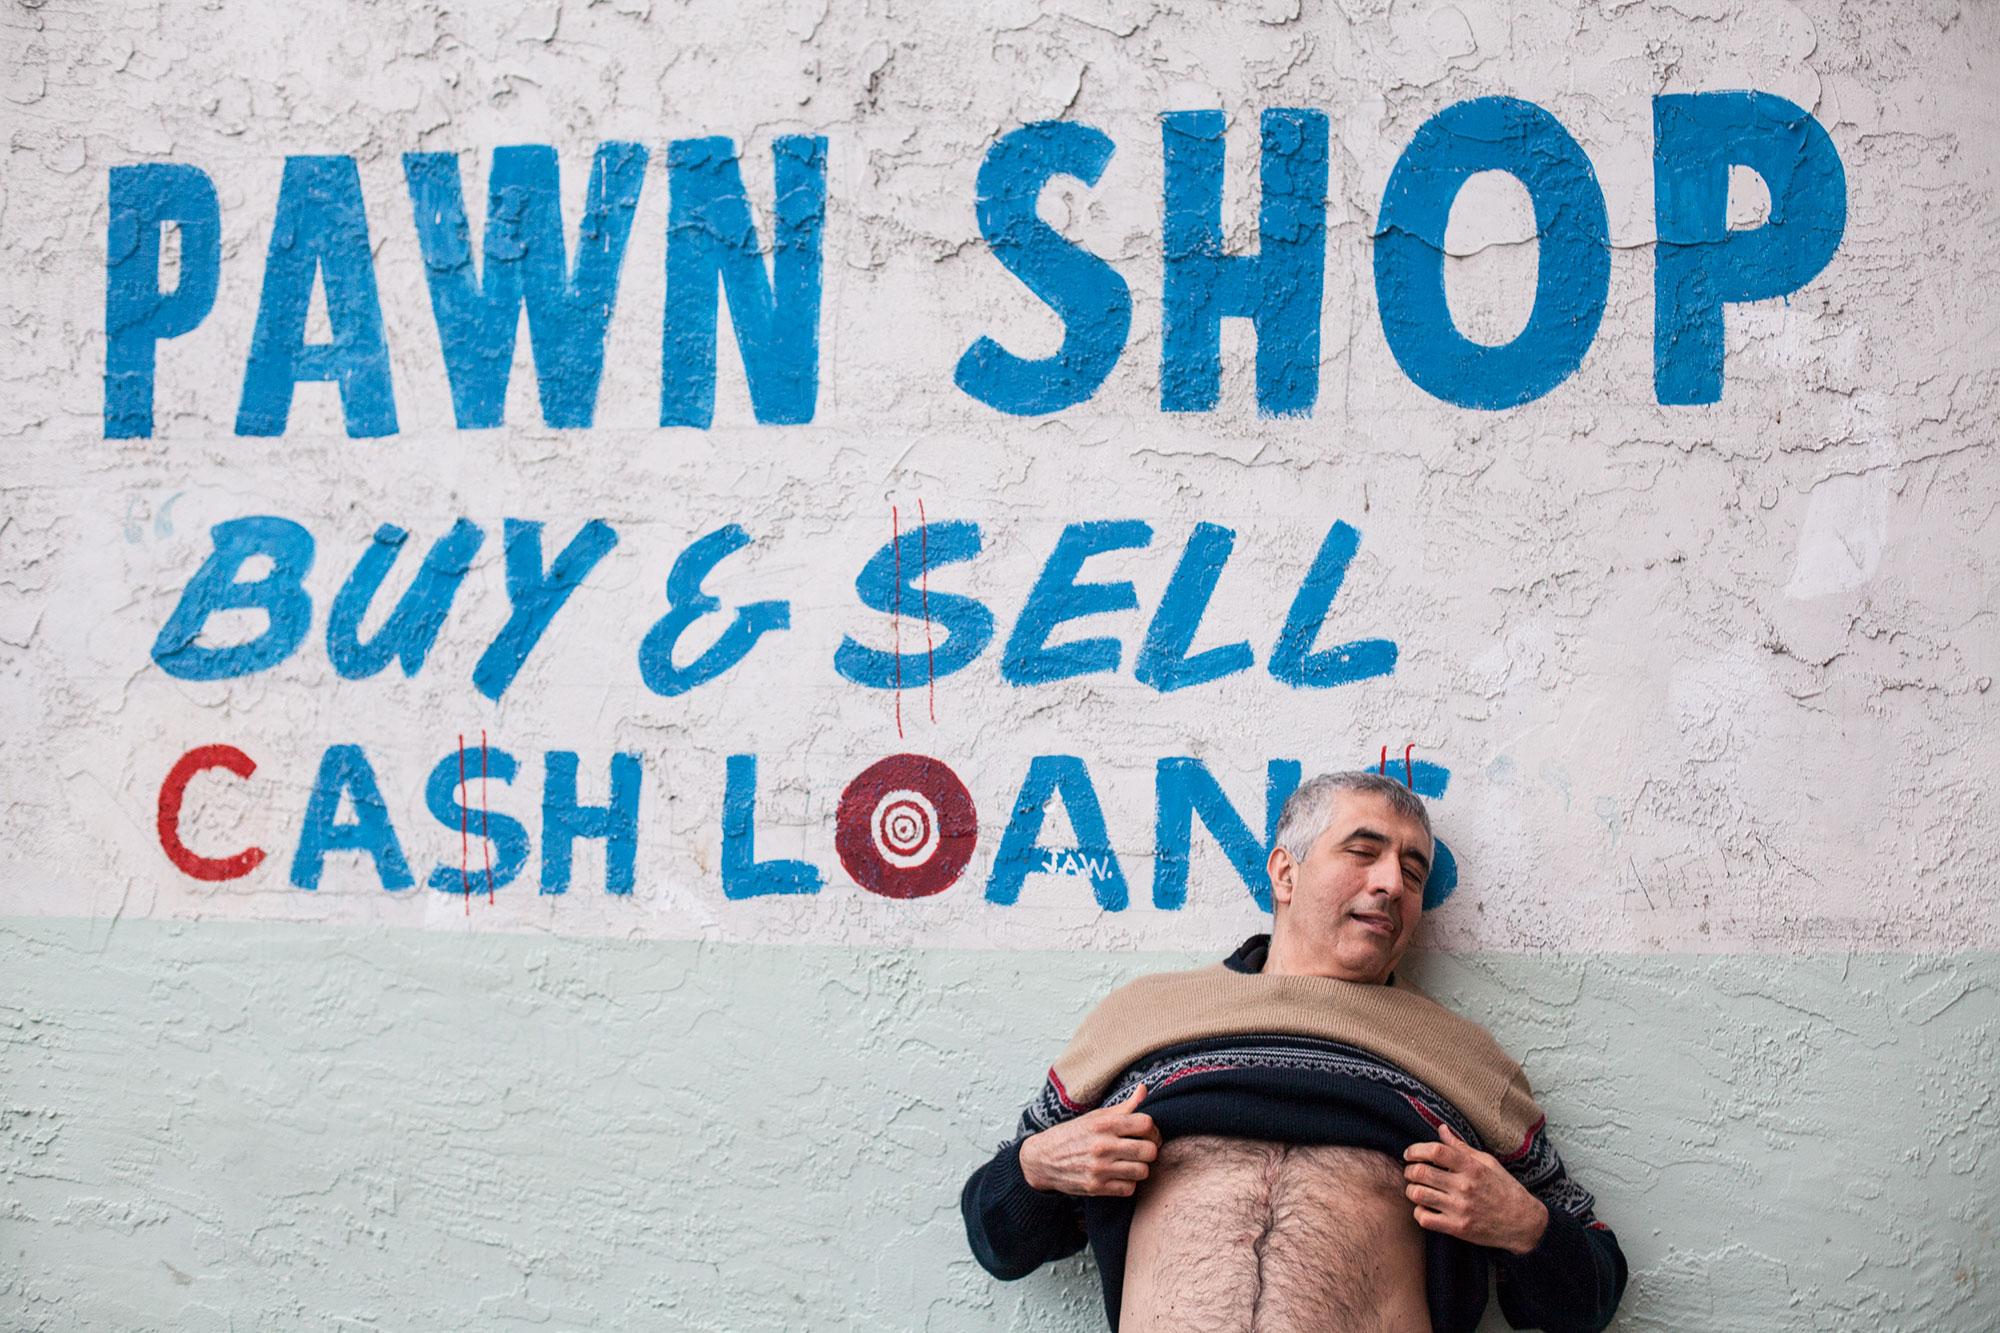 The-Sandwich-Nazi - Pawn-Shop-01-web-resolution-(Photo-by-Benjamin-Taft)